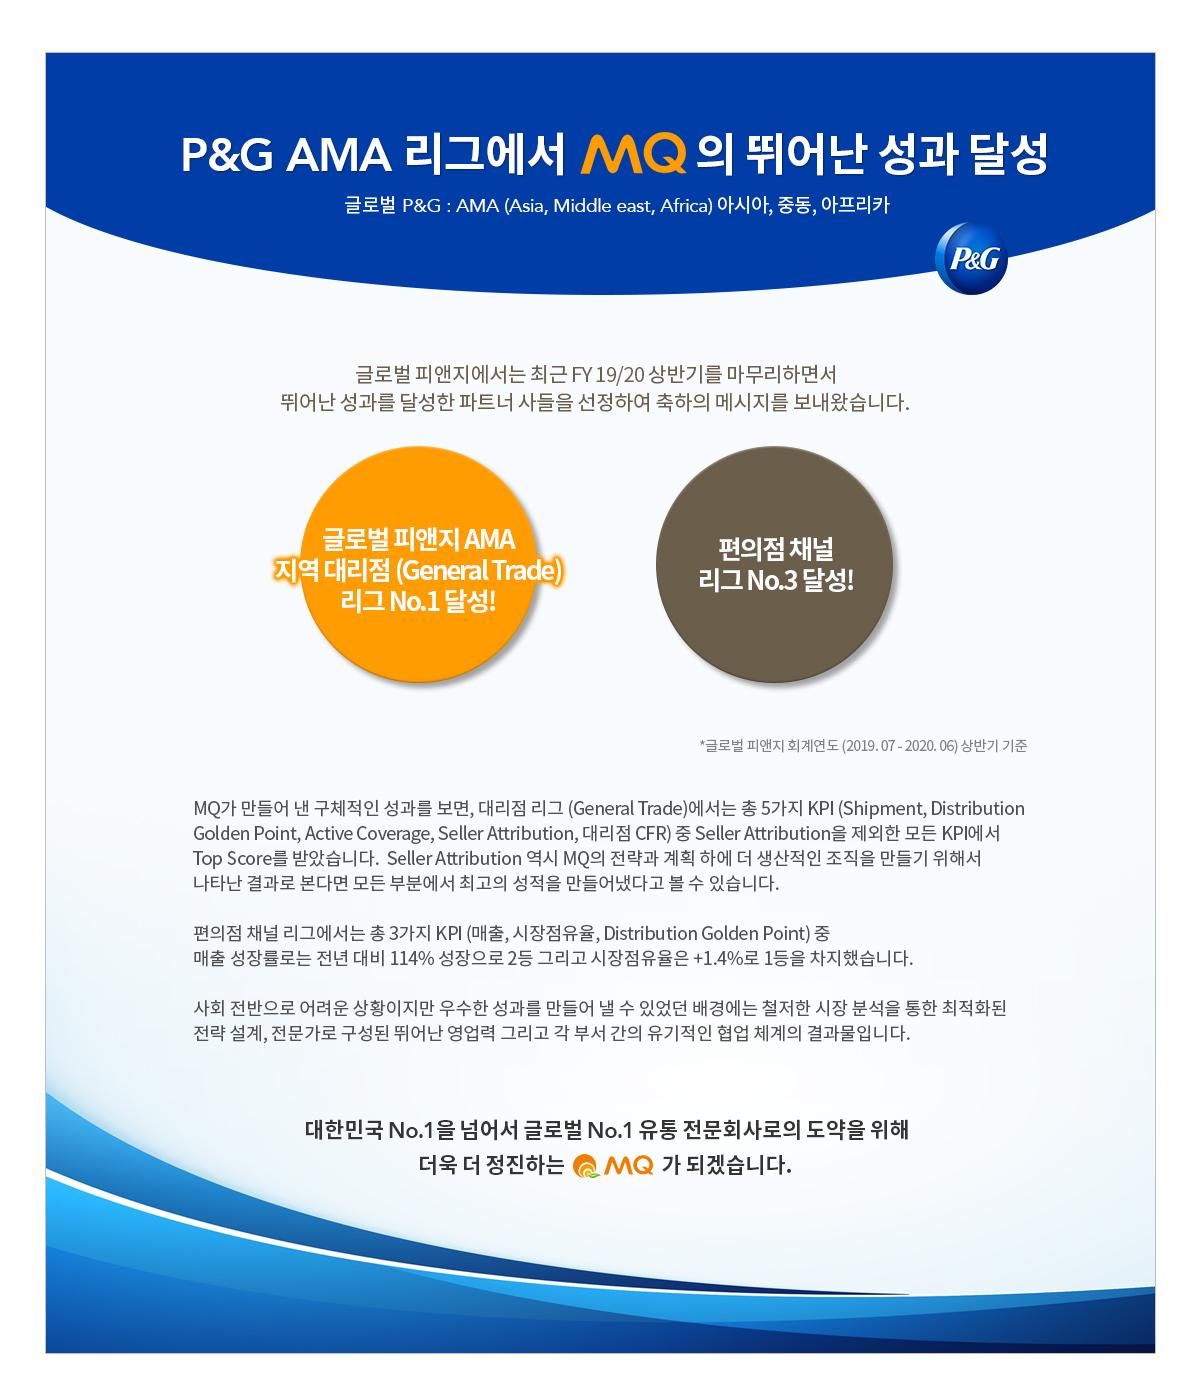 P&G AMA 지역대리점 리그 NO.1 달성